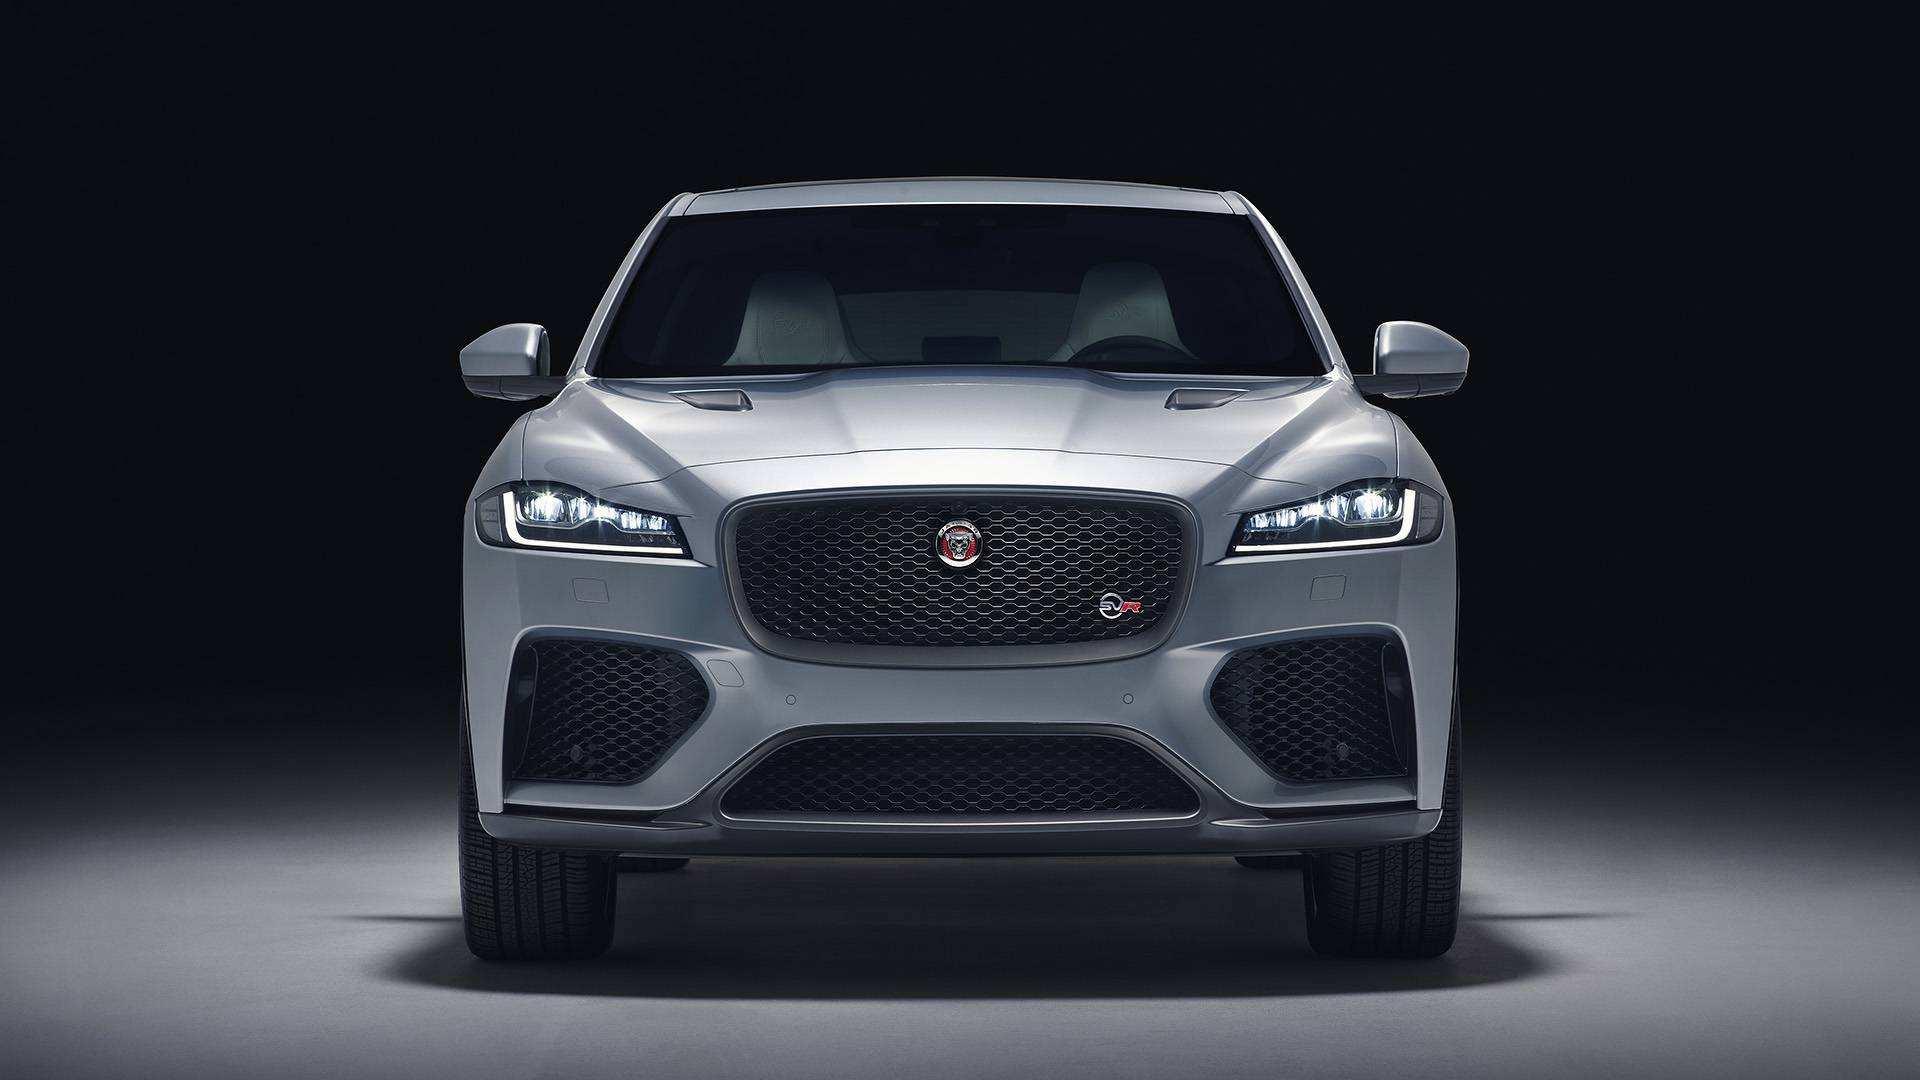 39 Concept of Jaguar I Pace 2020 Model 2 Rumors by Jaguar I Pace 2020 Model 2